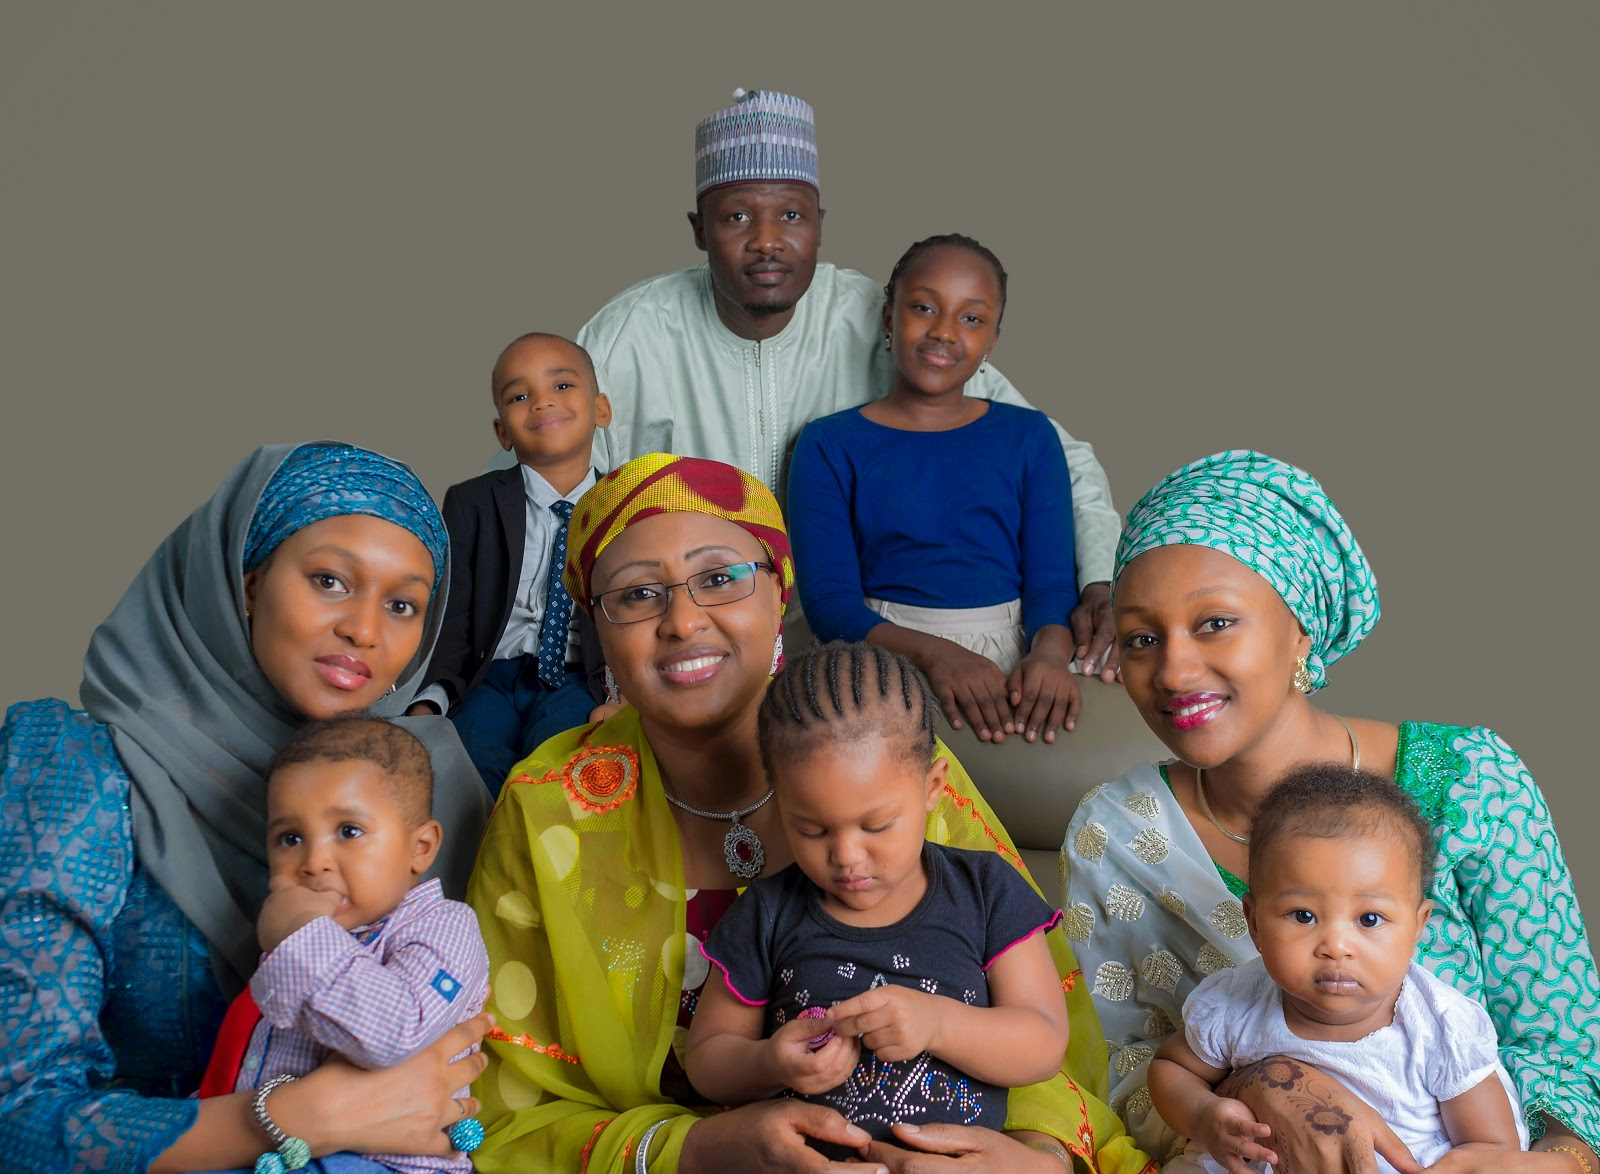 Buhari's family